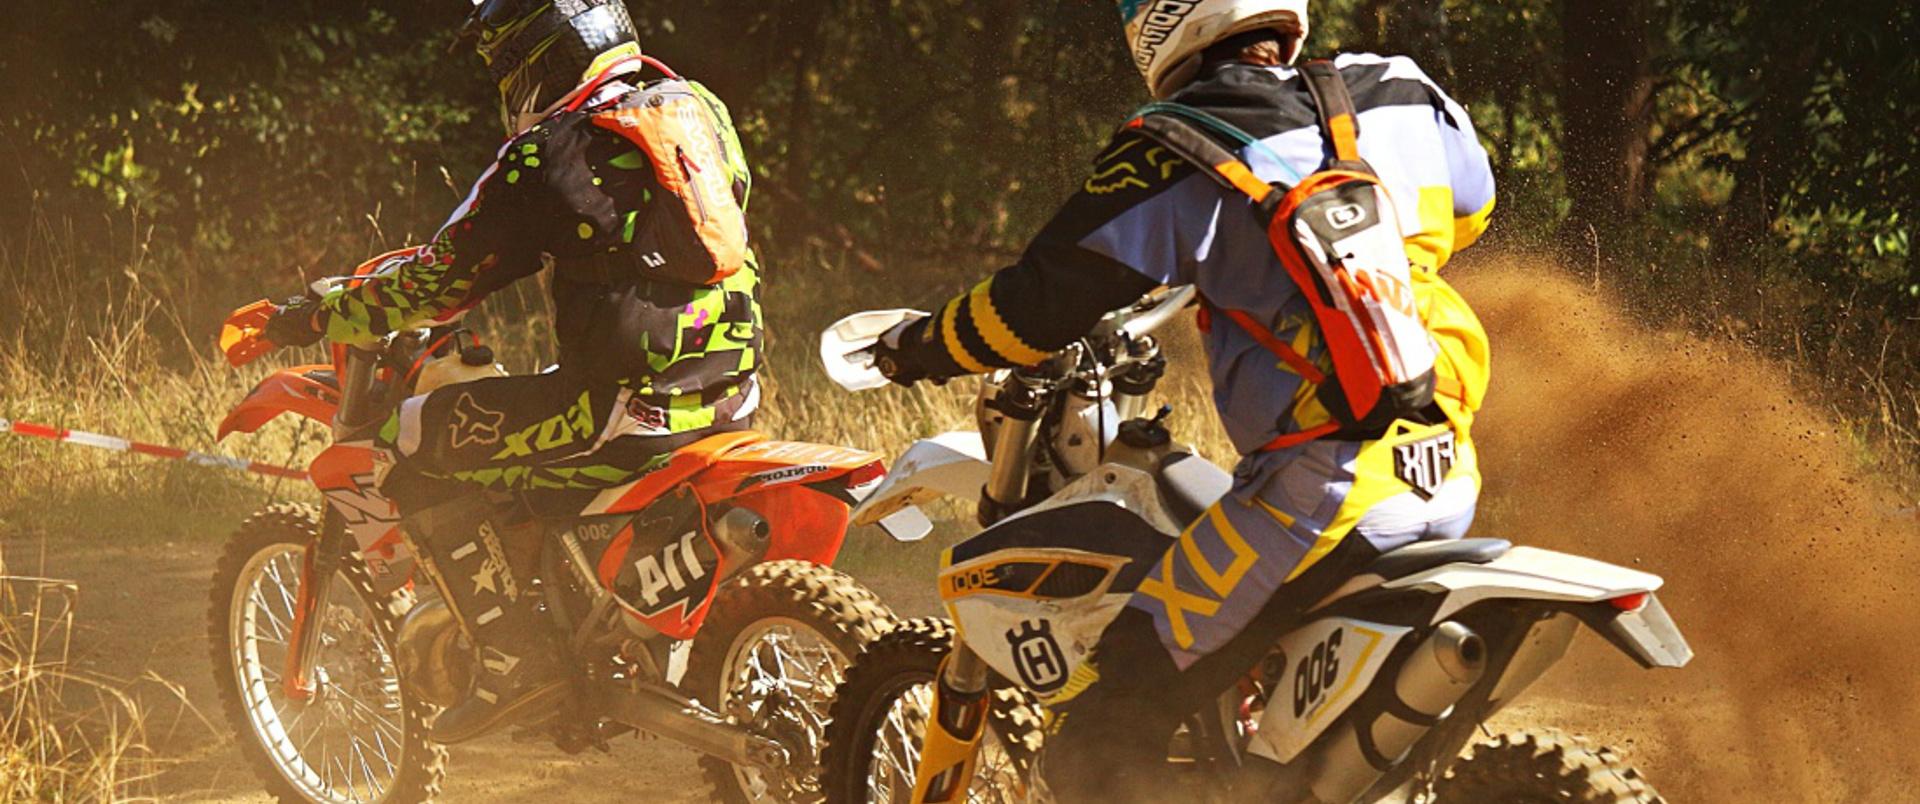 Foto: motocross